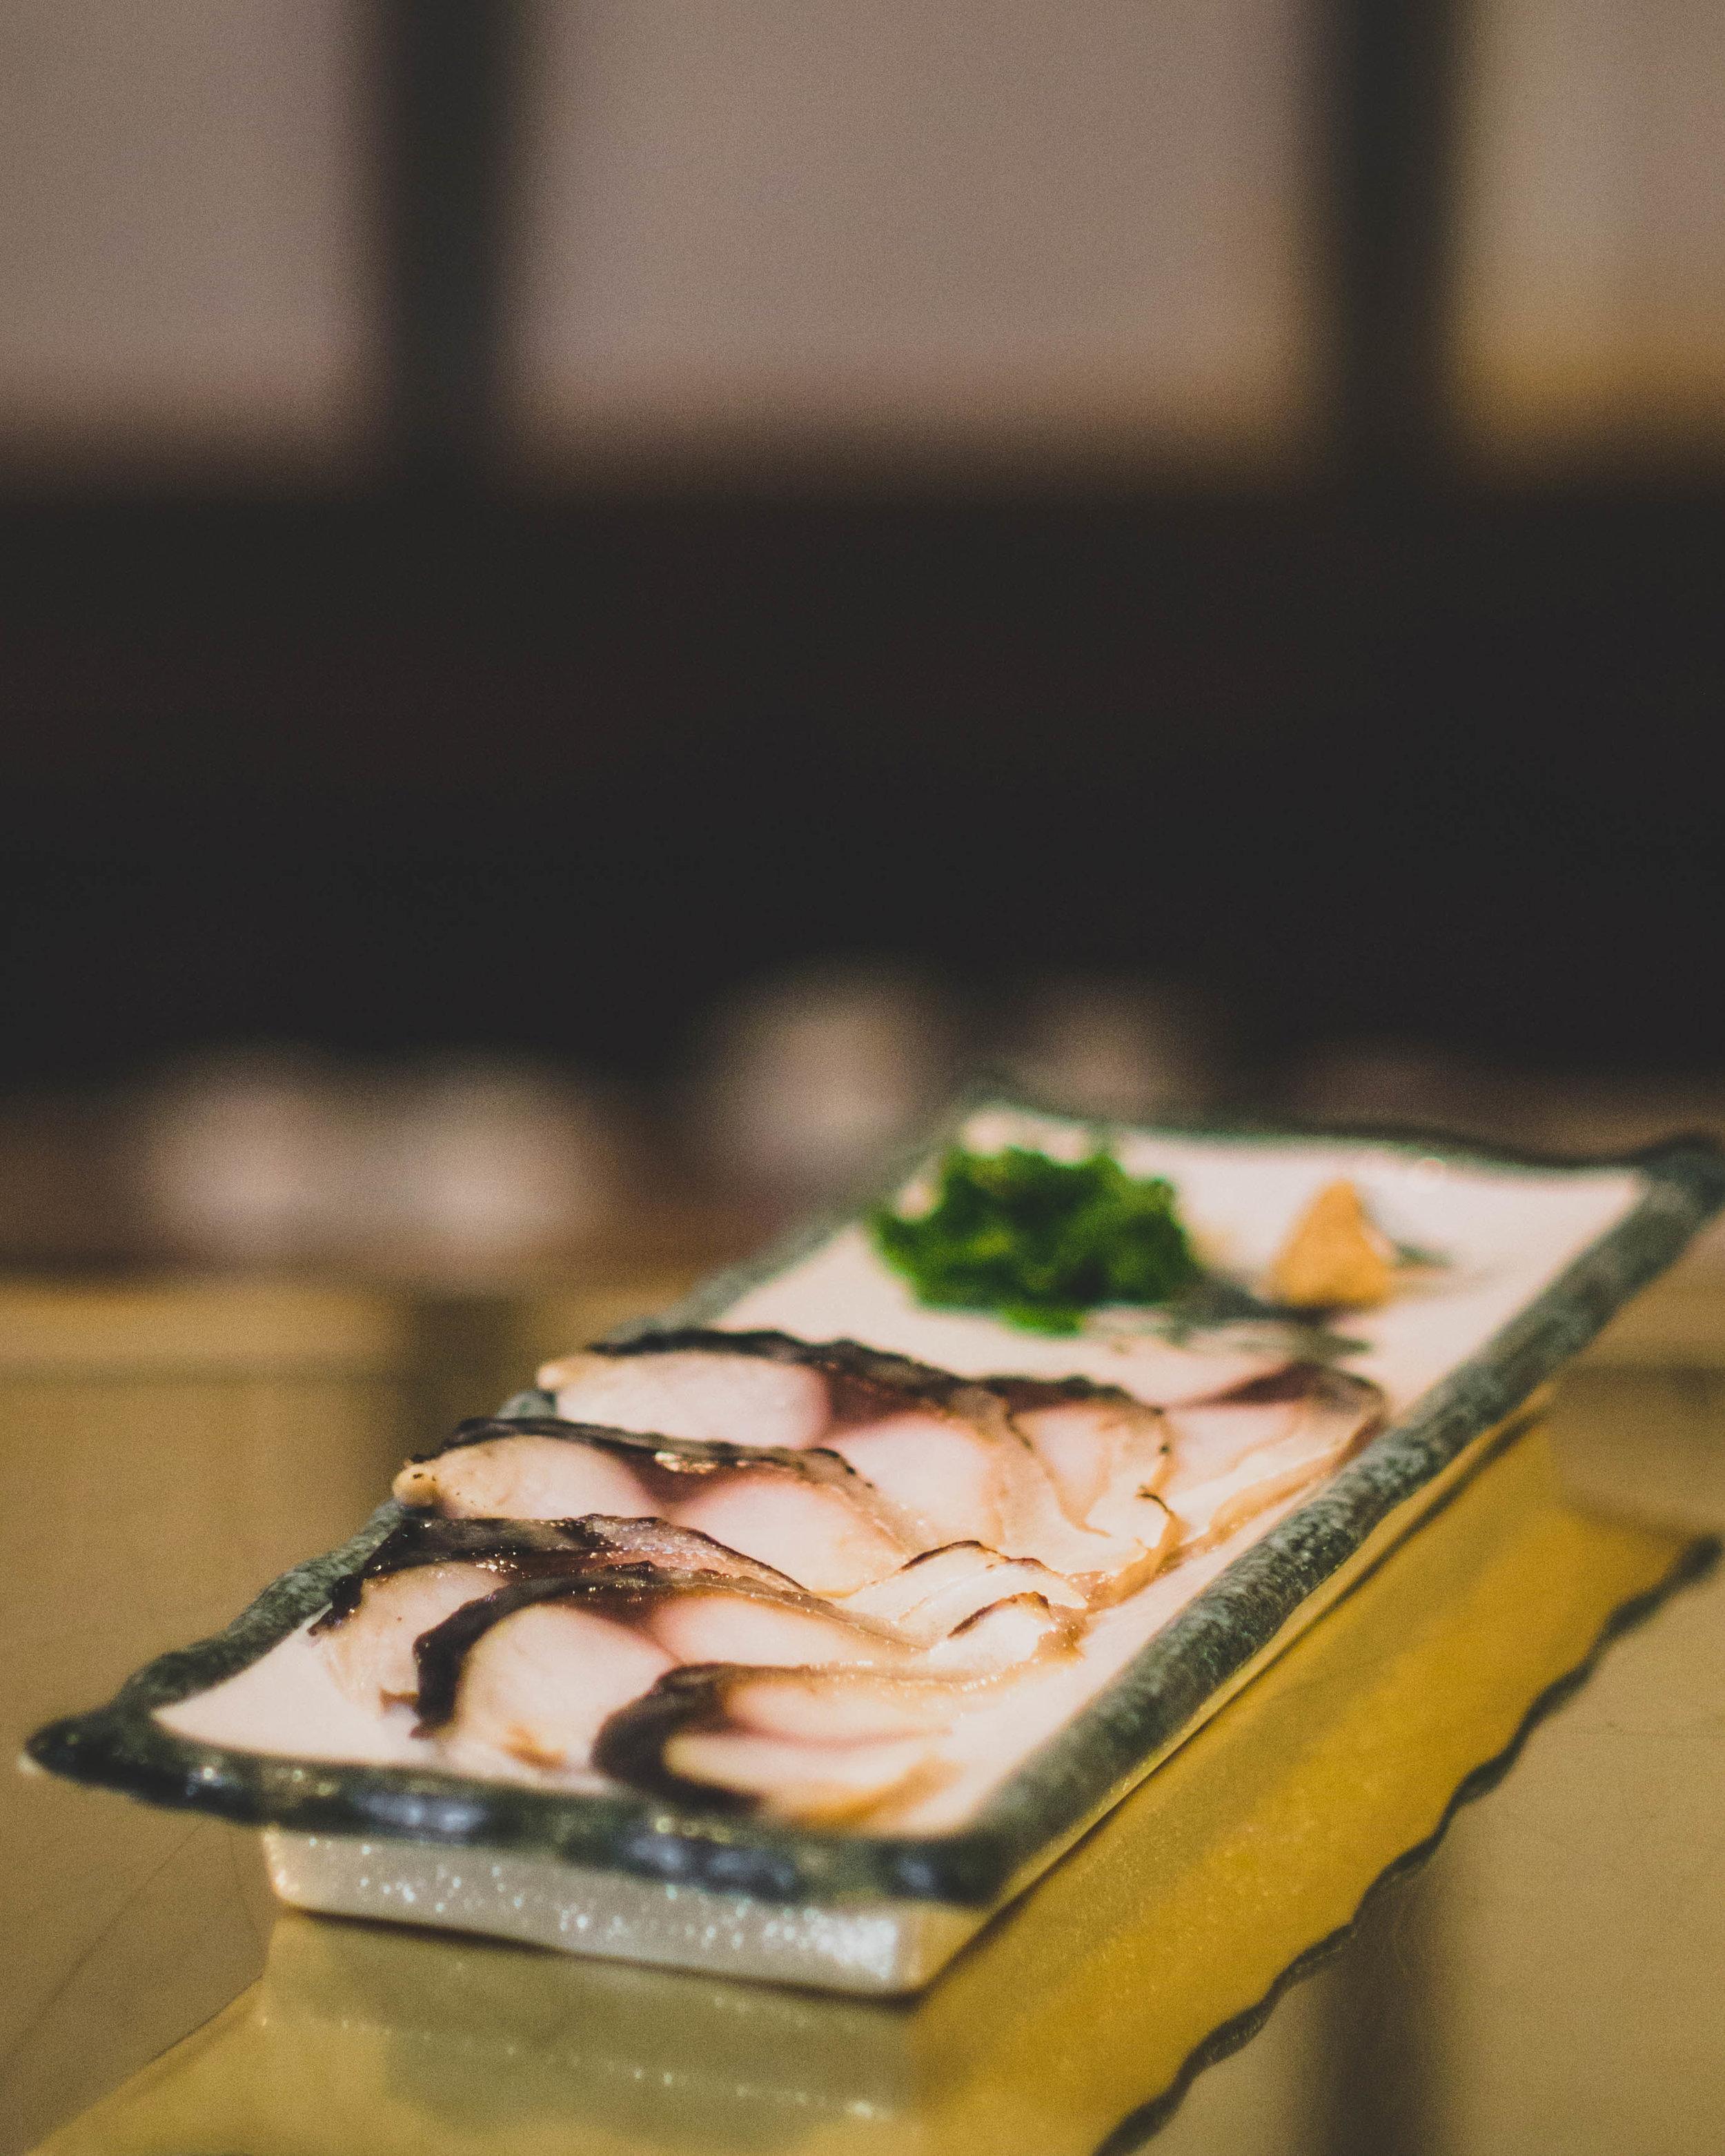 SEARED MACKEREL* - Vinegar cured mackerel